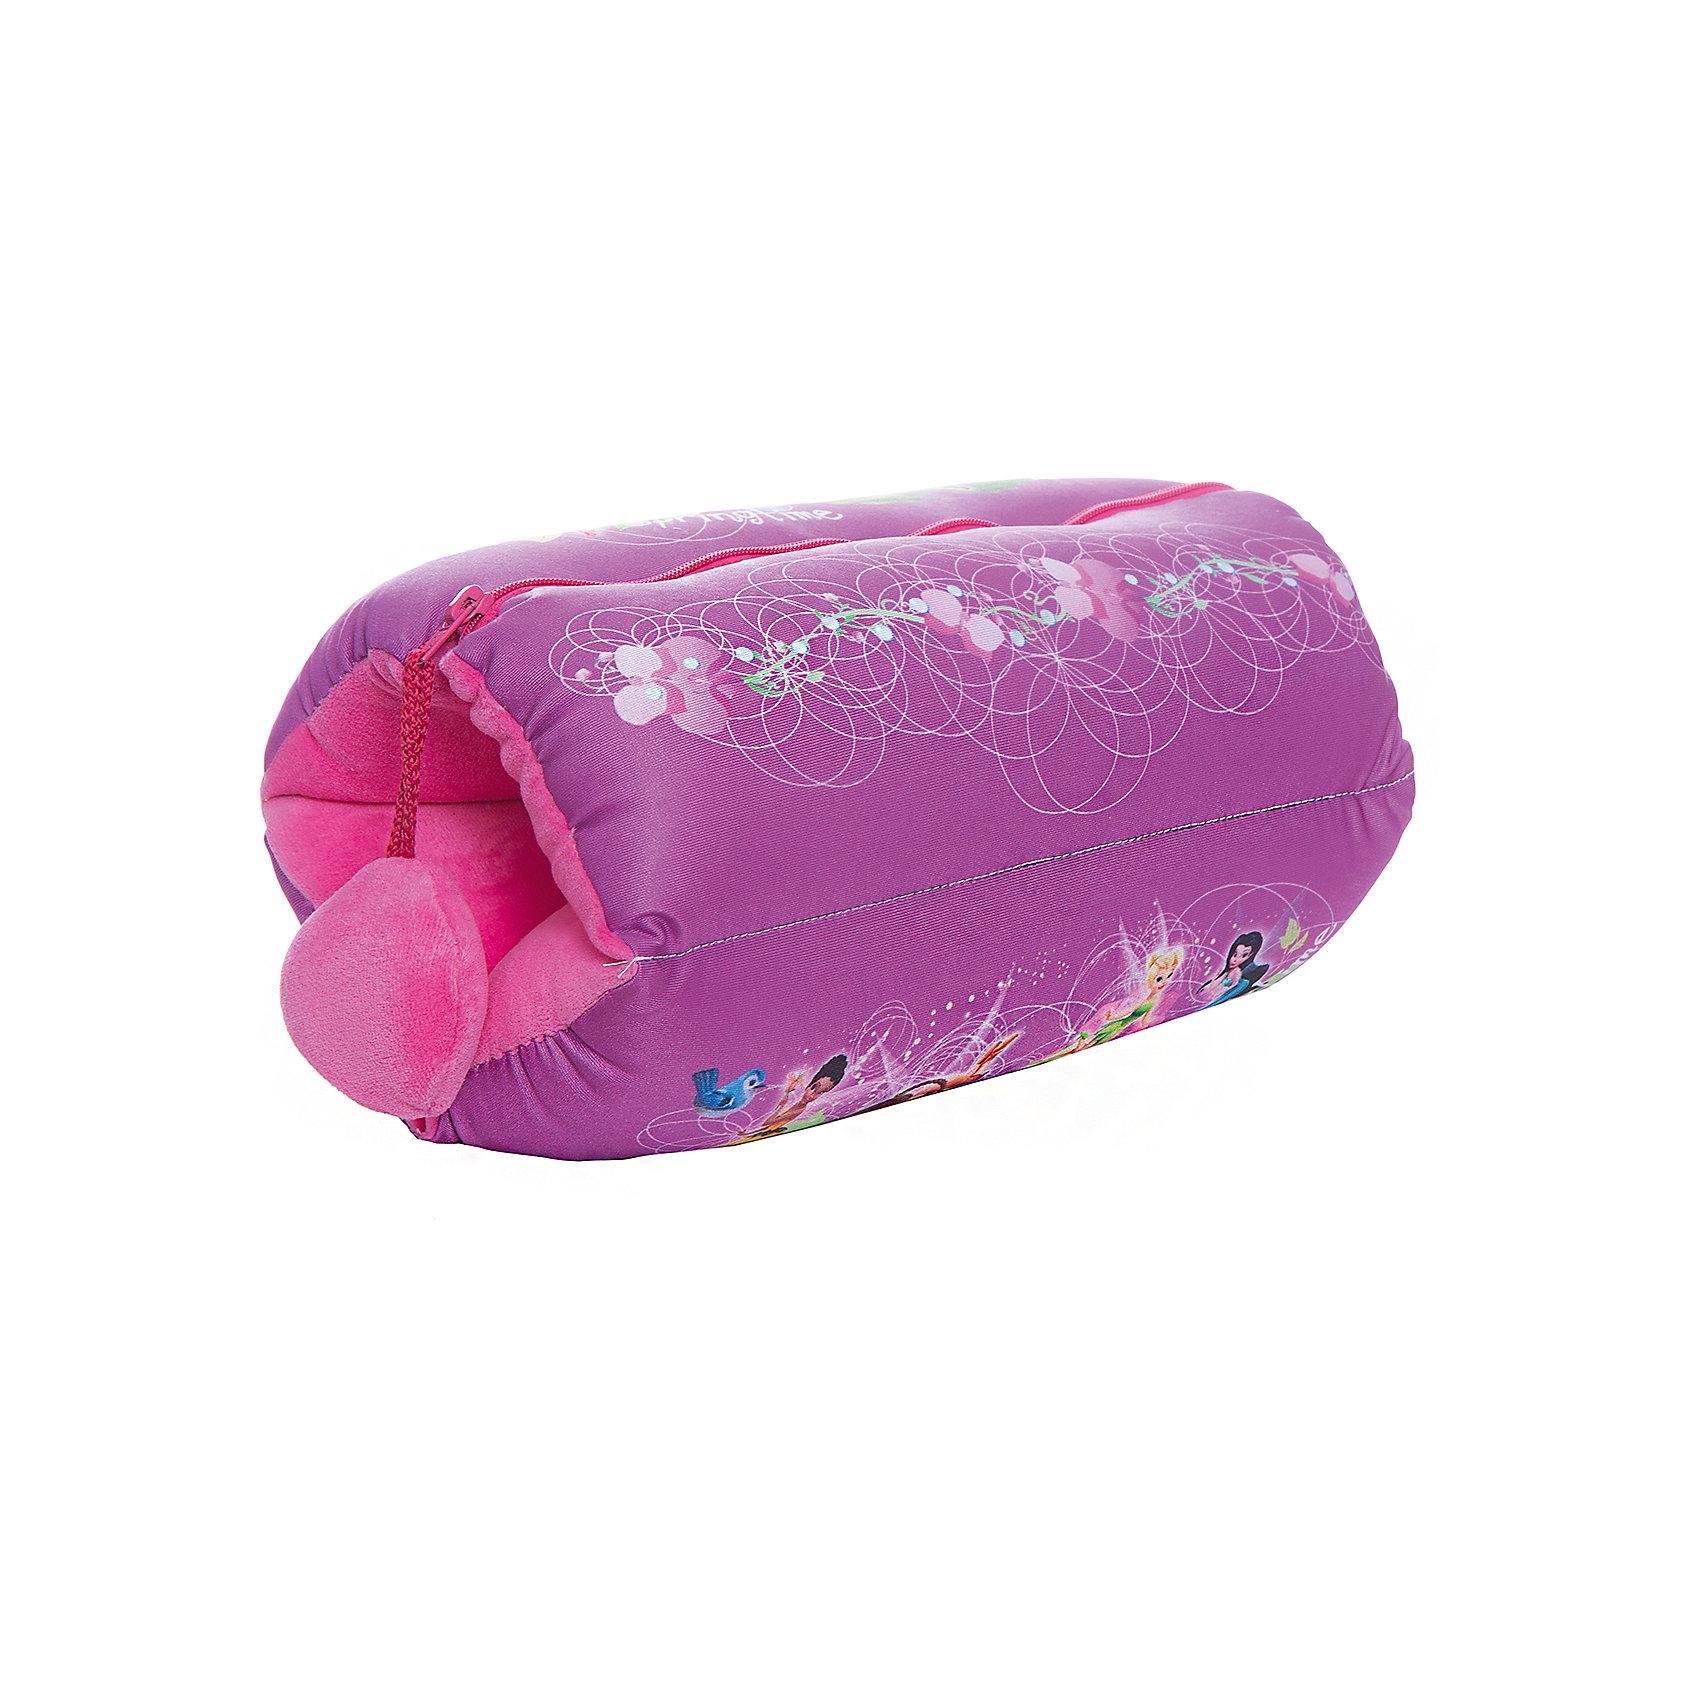 Игрушка антистресс муфточка Феи В46, арт. 51761-2, Small Toys, розовый